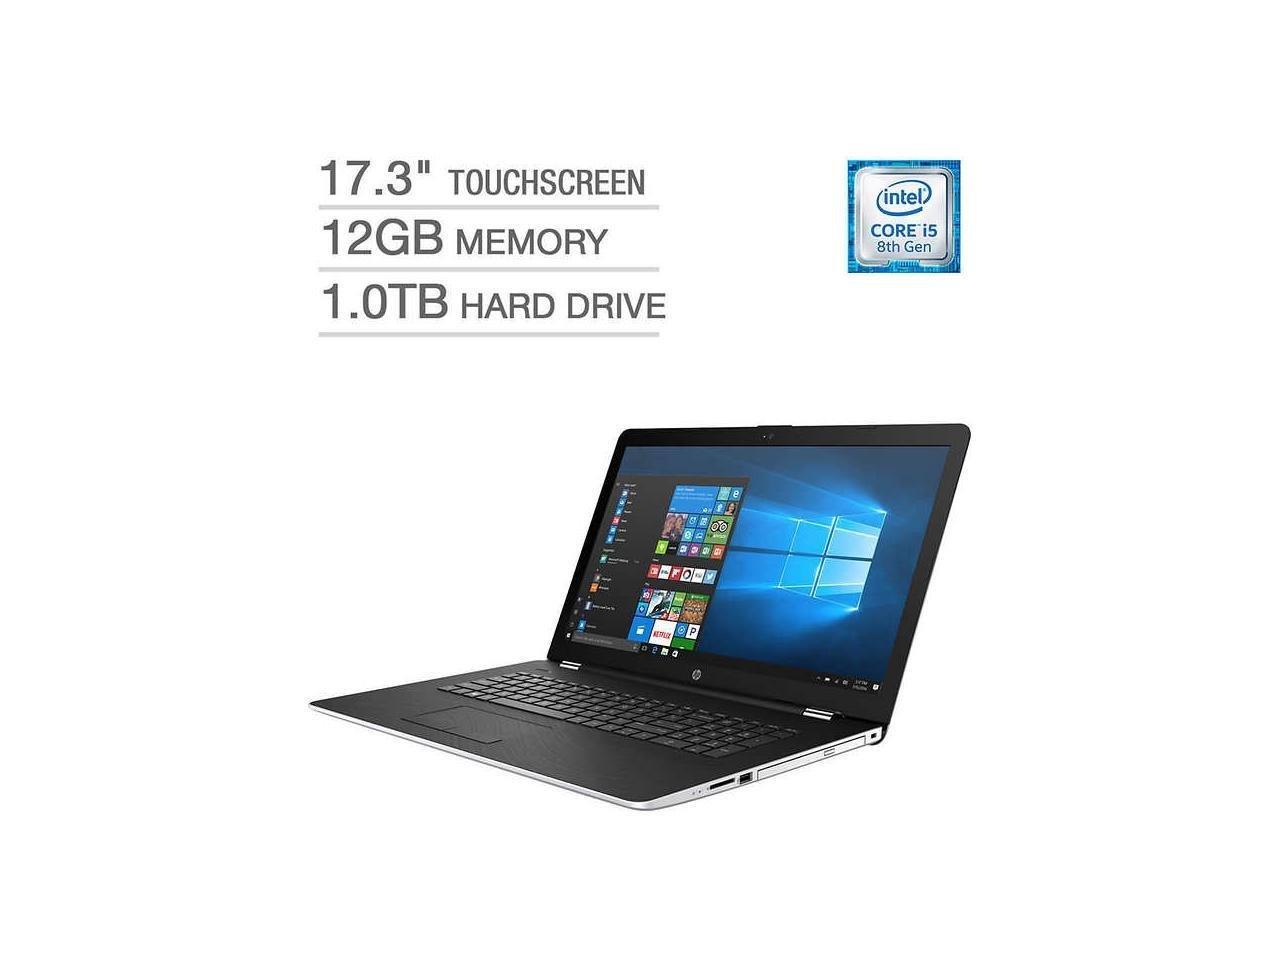 "2018 HP 17 17.3"" TouchScreen HD+ (1600x900) Business Laptop - 8th Gen Intel Quad-Core i5-8250U, 12GB DDR4, 1TB HDD, AMD Radeon 530, DVD, Backlit Keys, WiFi AC, RJ45, Windows 10 (Certified Refurbished)"